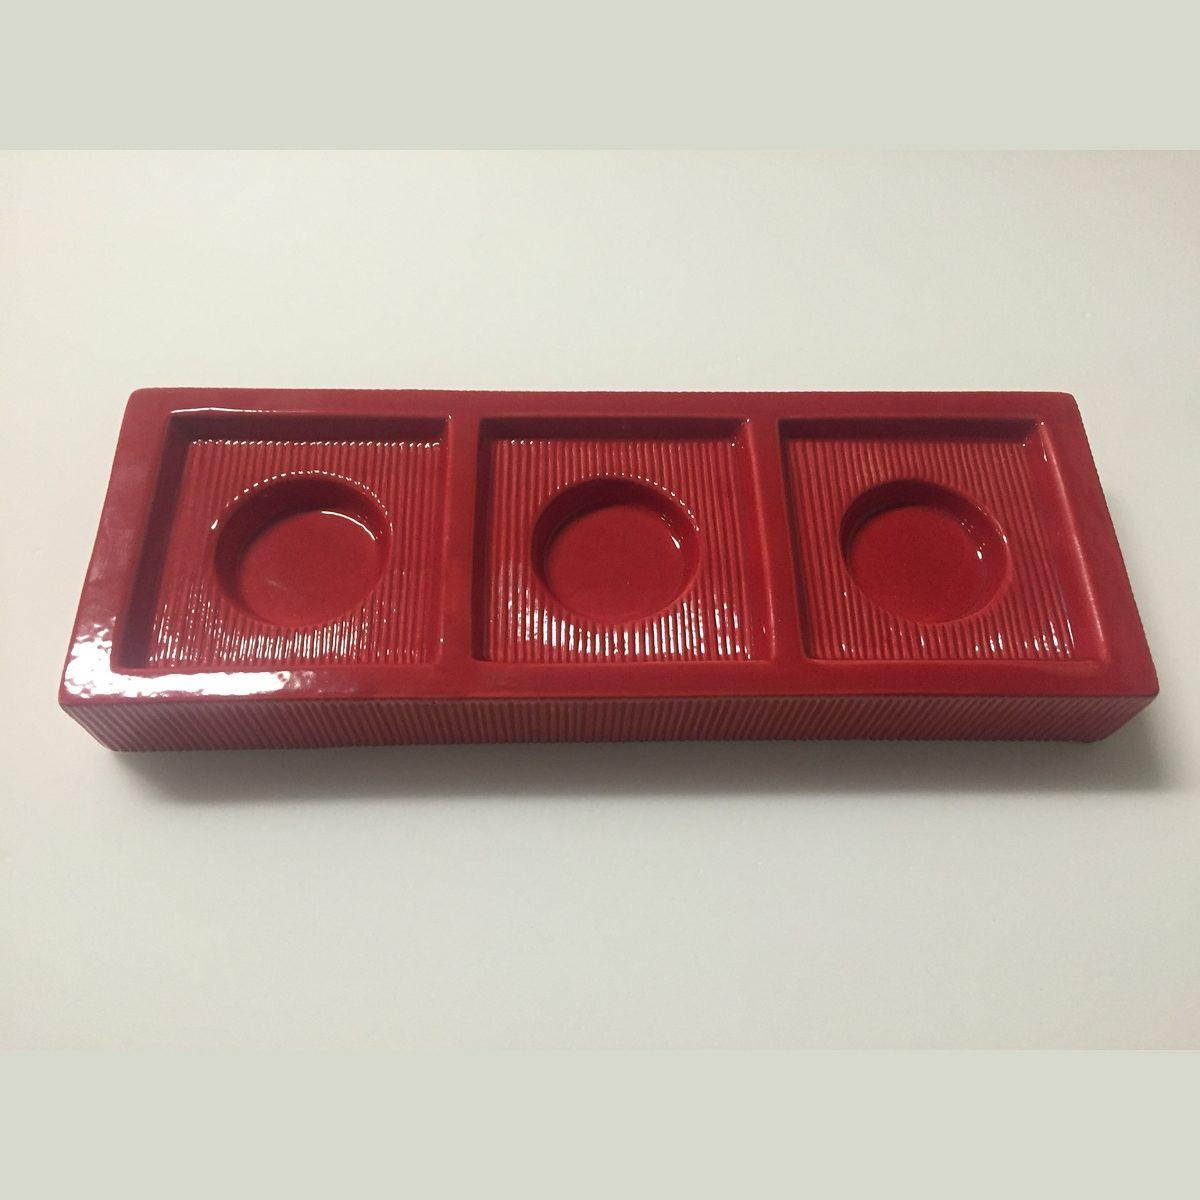 CULTDESIGN Cult Design Teelichthalter CHANGE Basic rot - Solo